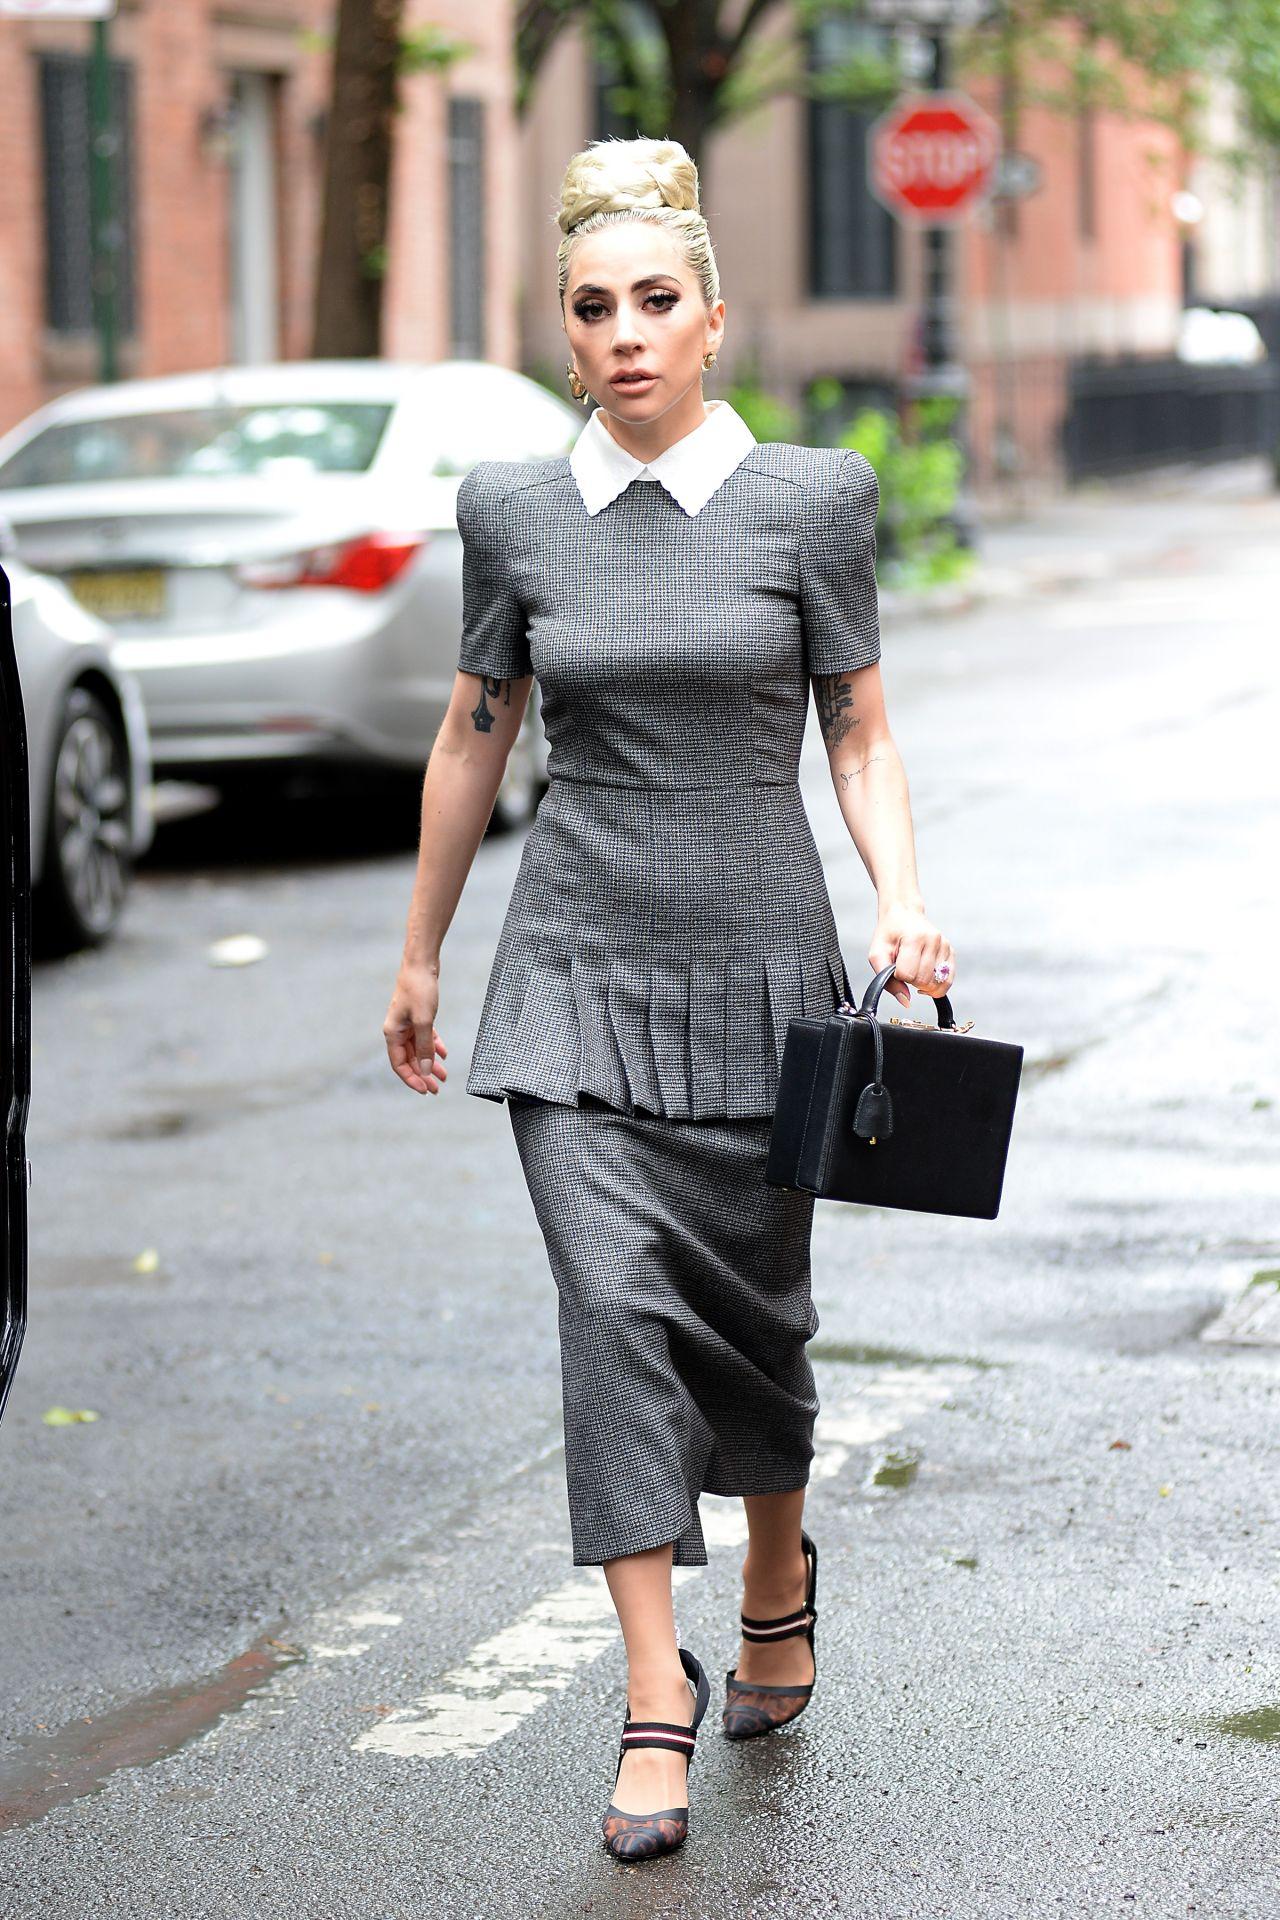 Lady Gaga Style And Fashion West Village New York City 05 27 2018